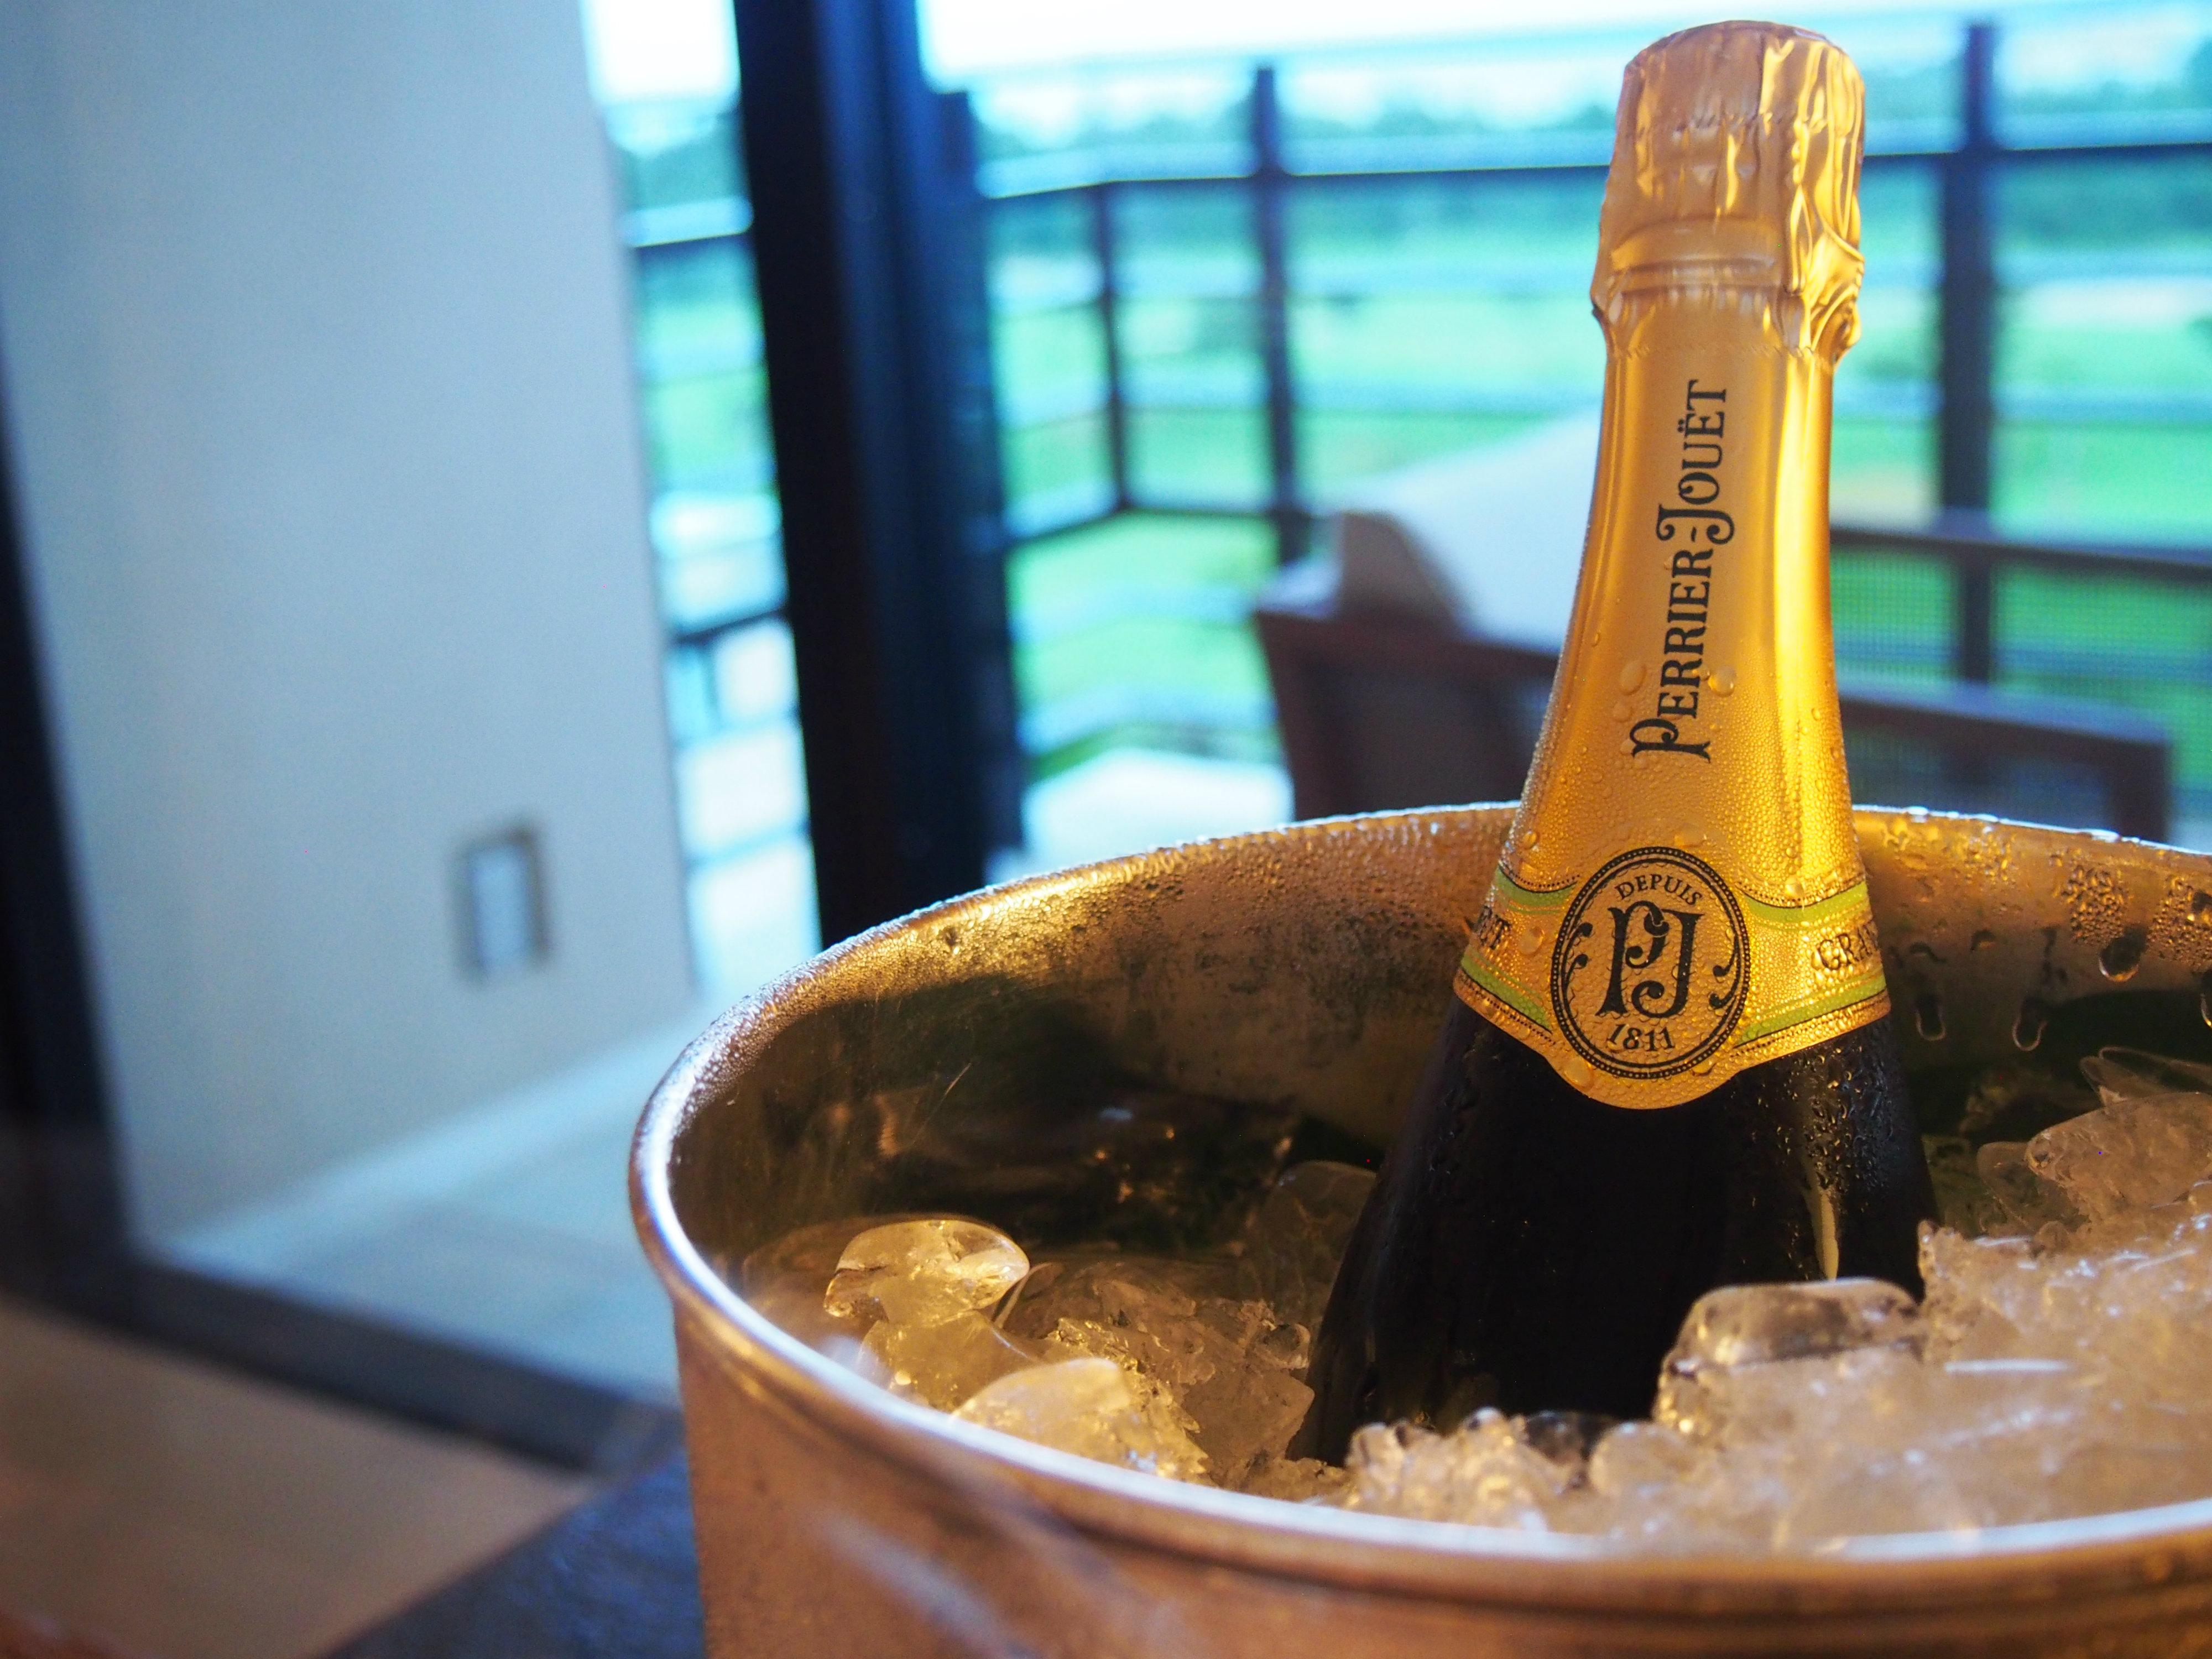 Ritz-Carlton Okinawa champagne